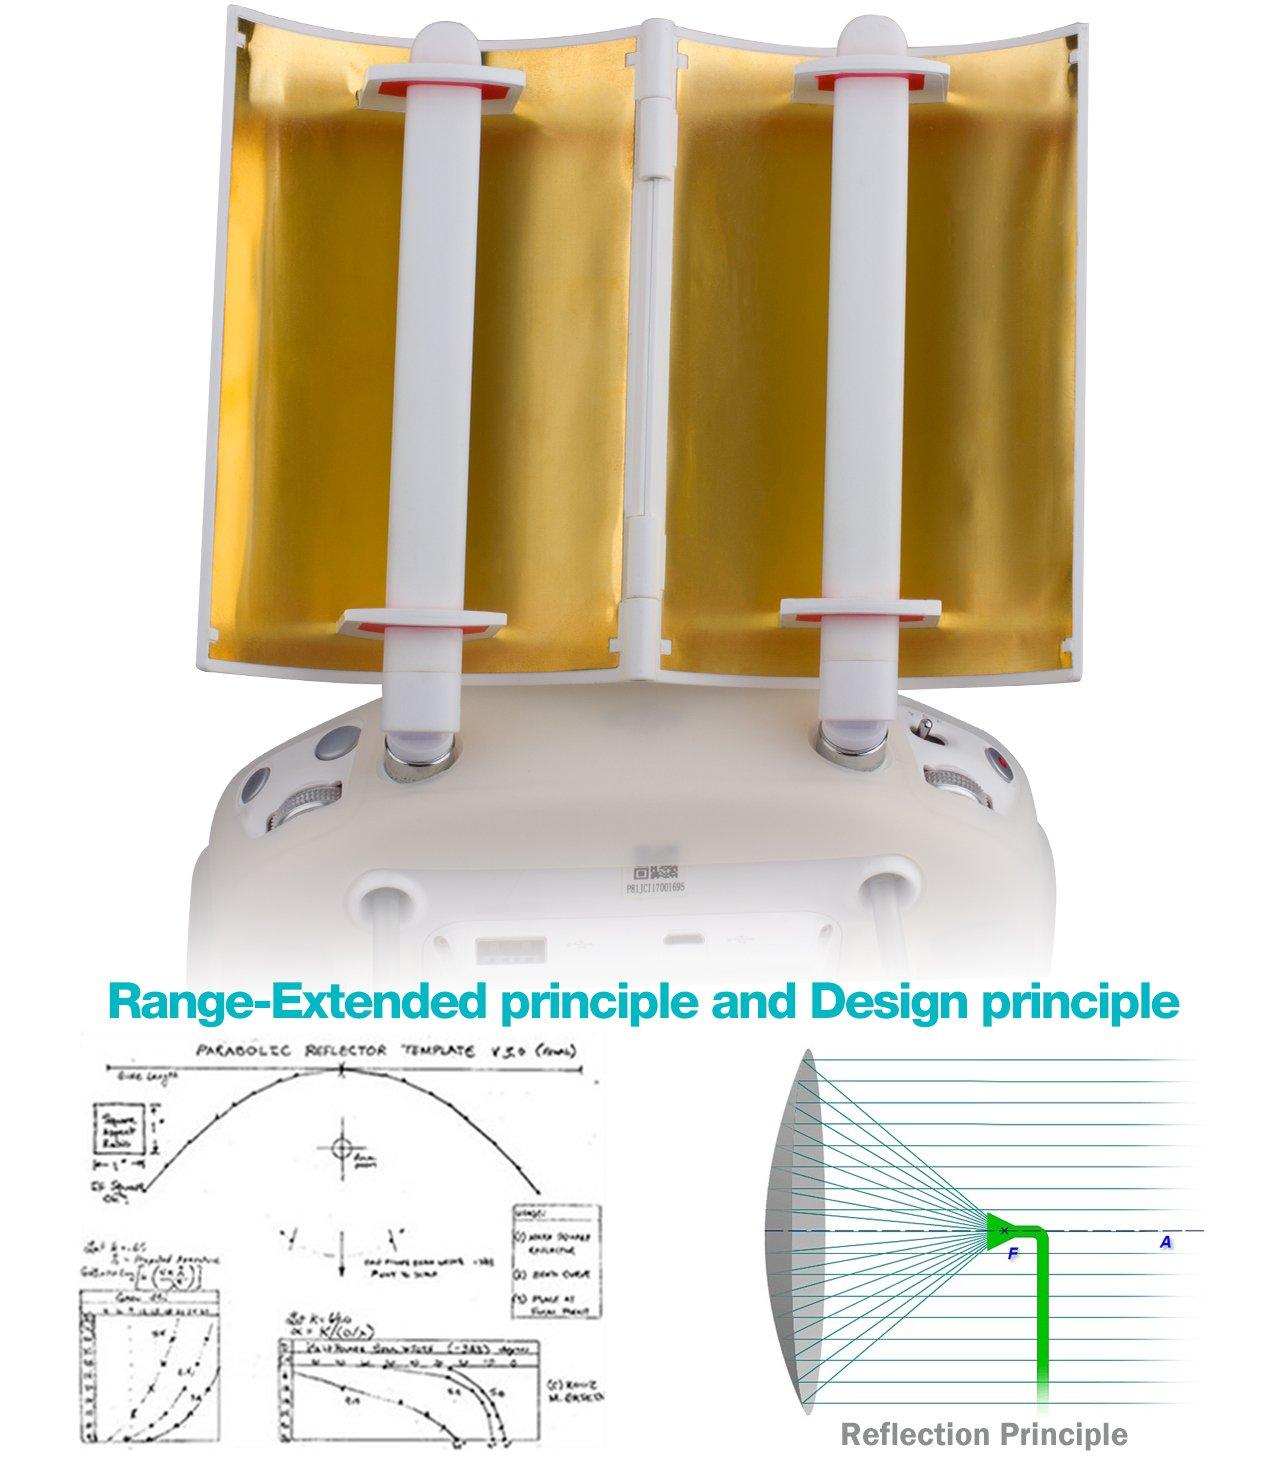 TOZO Antenna Signal Range Booster Parabolic Foldable for DJI Phantom 4 Gold Phantom 3 Professional//Advanced Inspire 1//2 Controller Transmitter Signal for Extended Extend